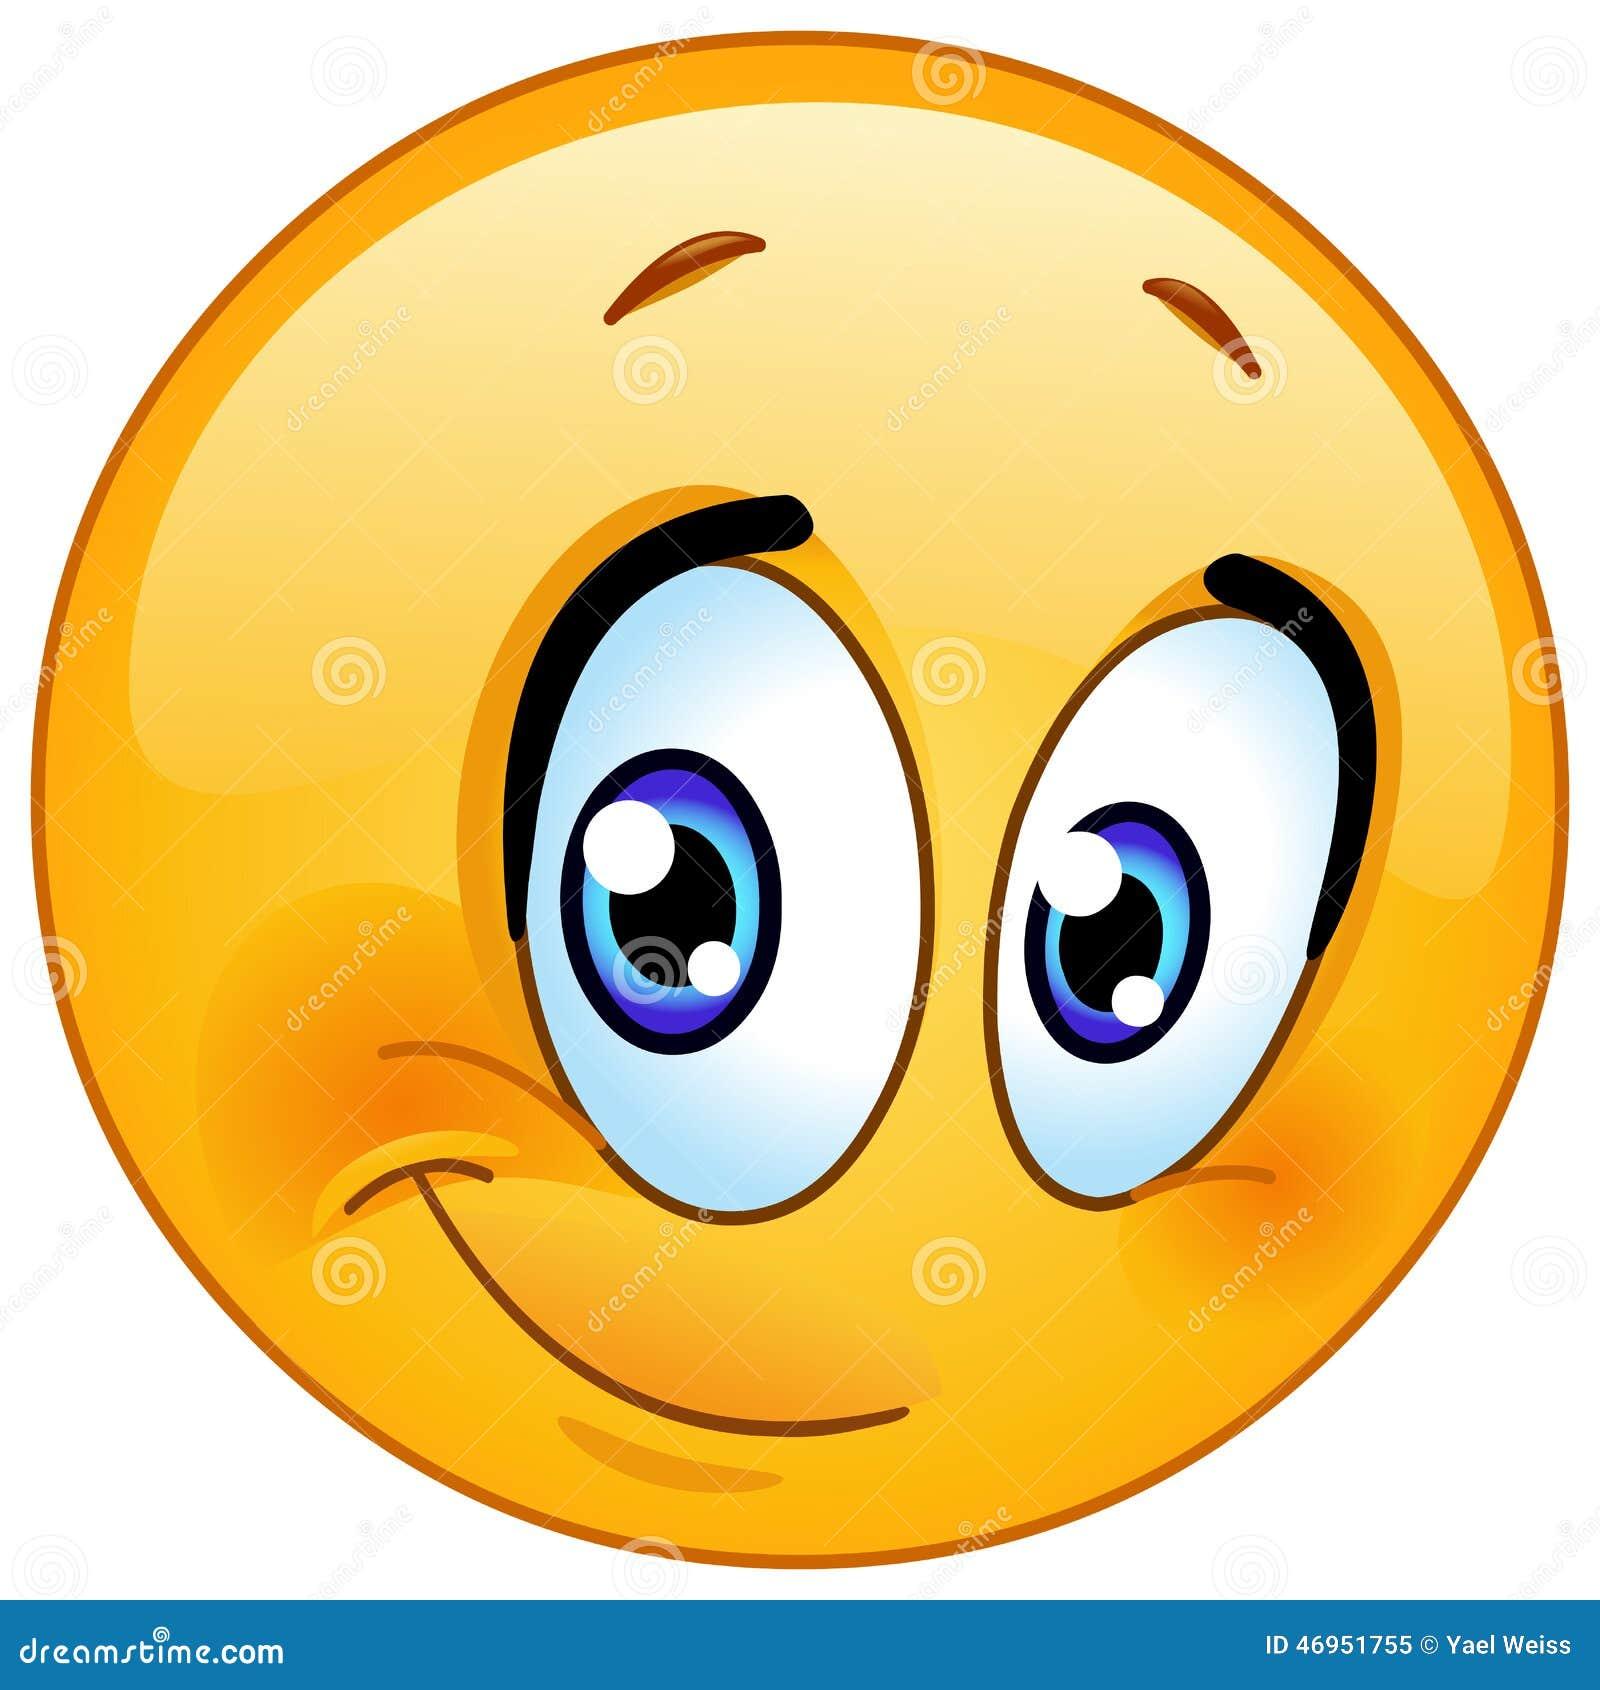 or seenoevil monkey emoji or hearno   dictionarycom